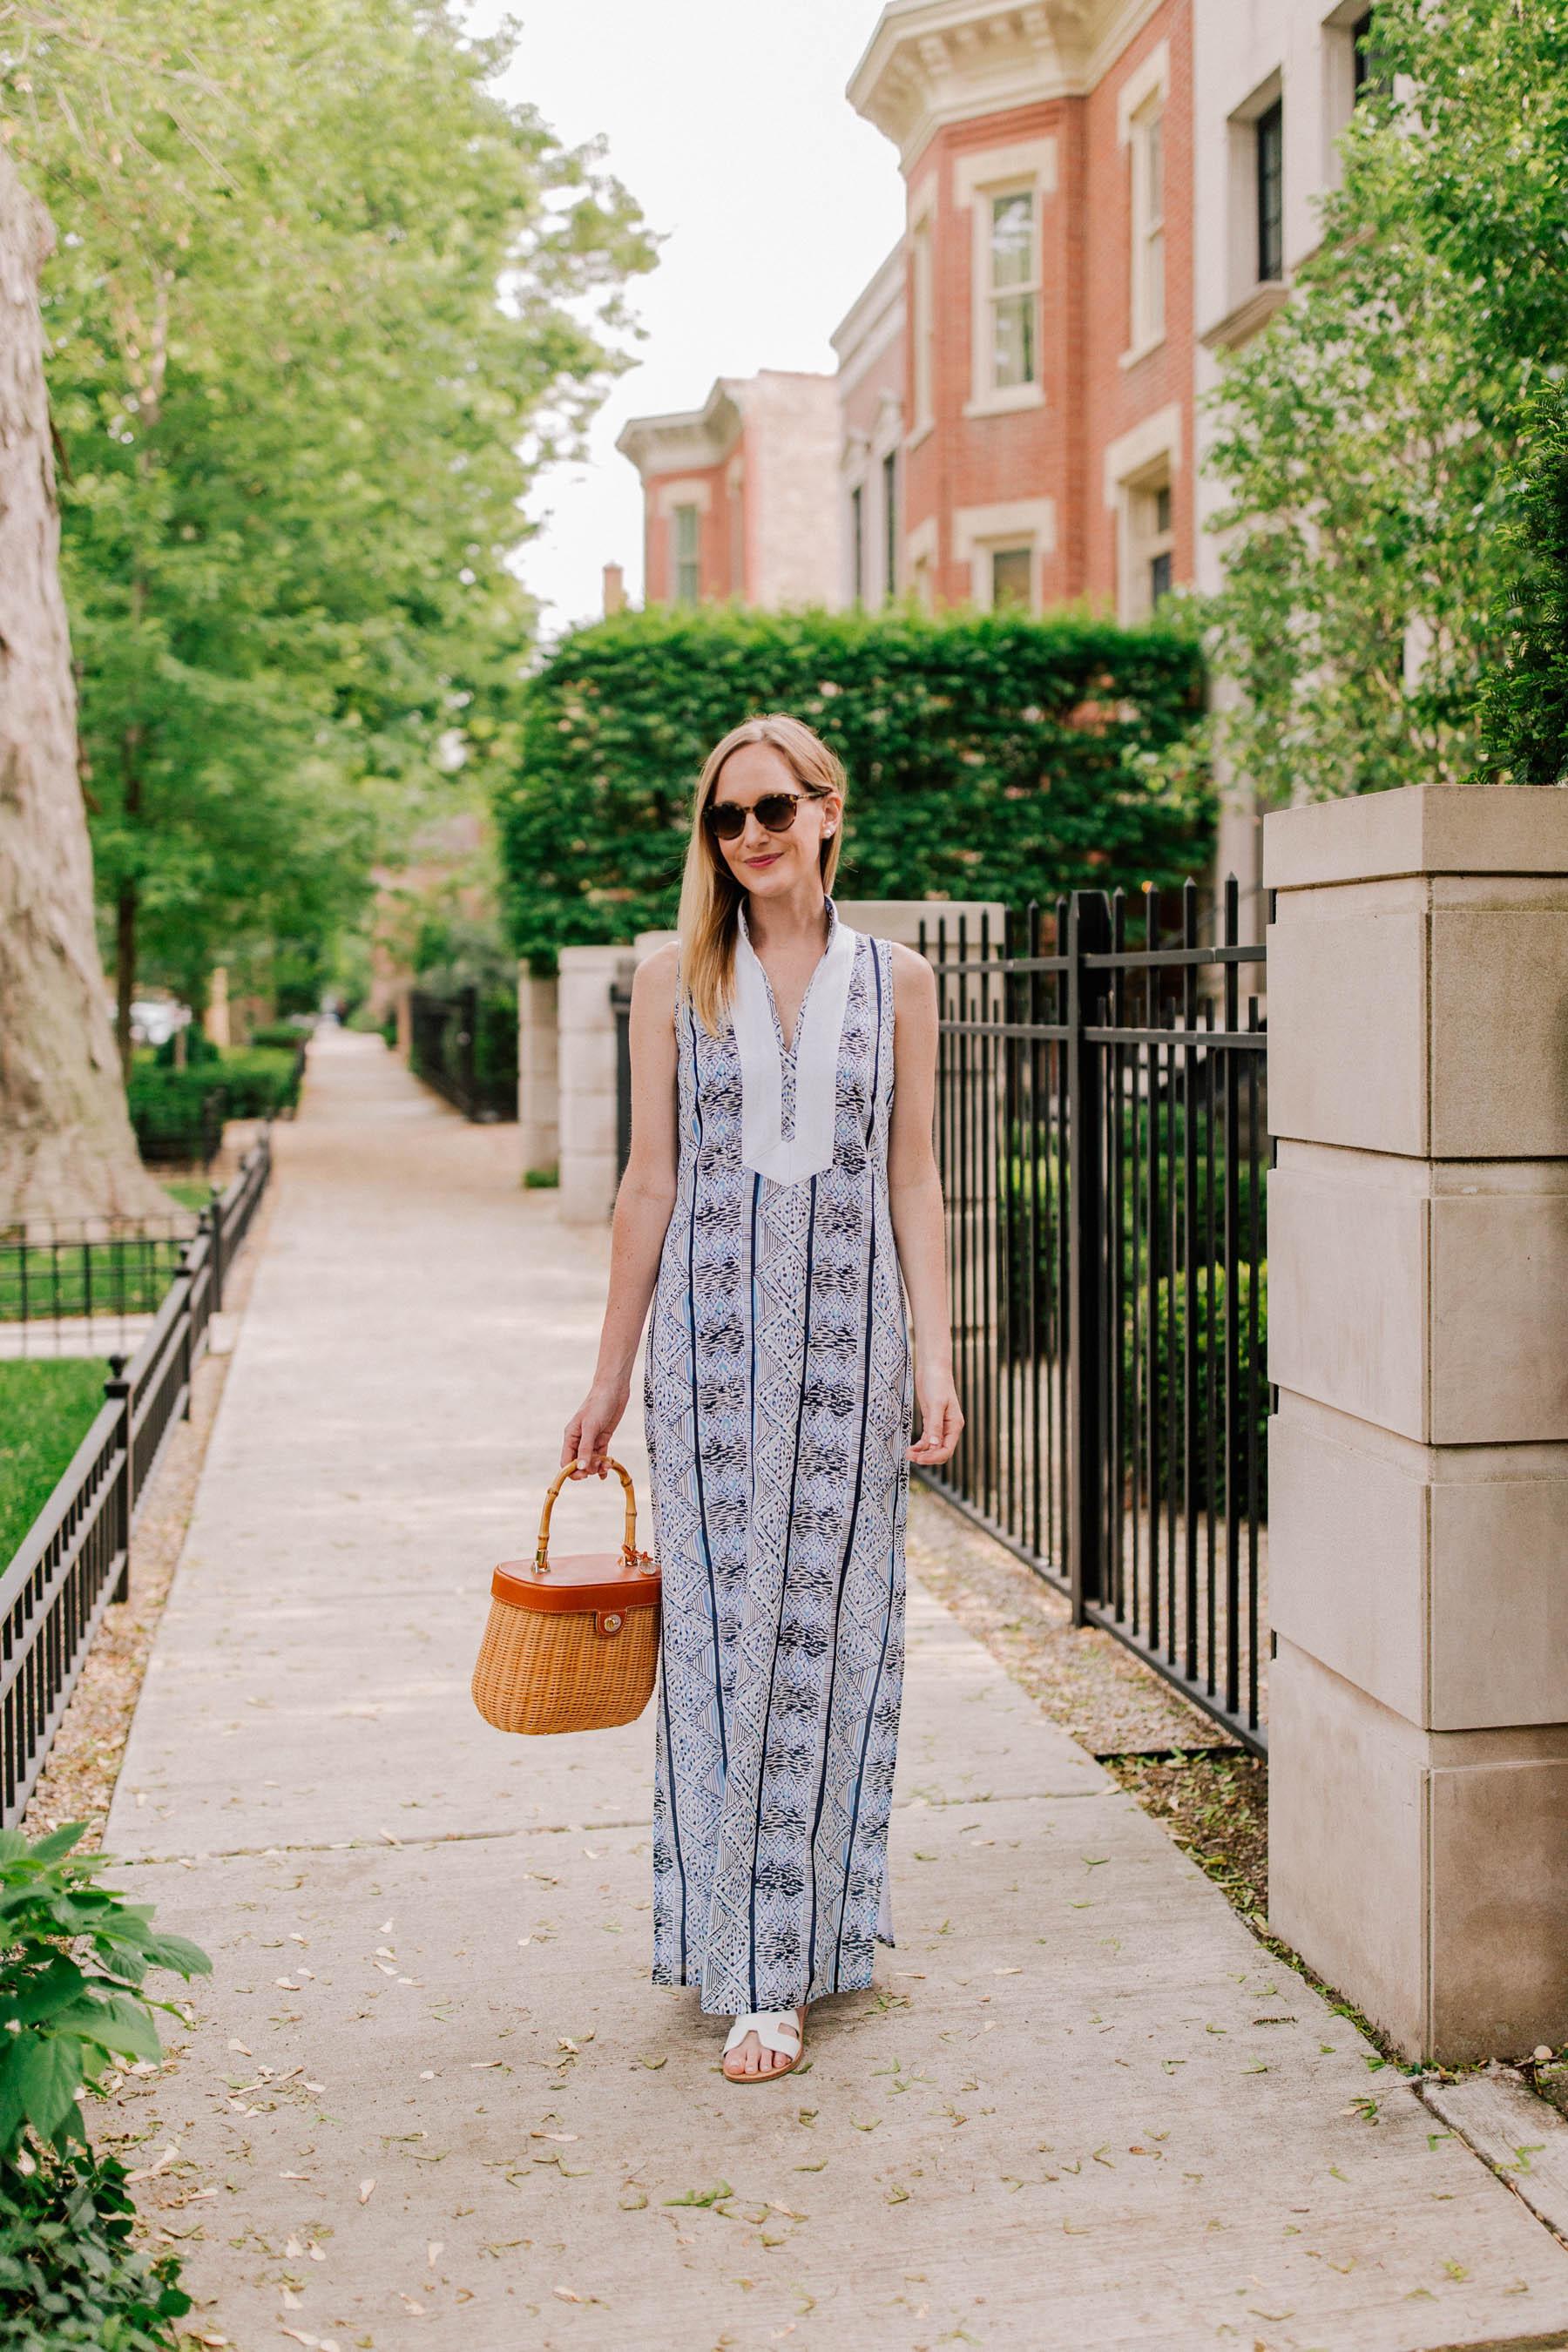 Kelly wearing Sail to Sable Maxi Dresses